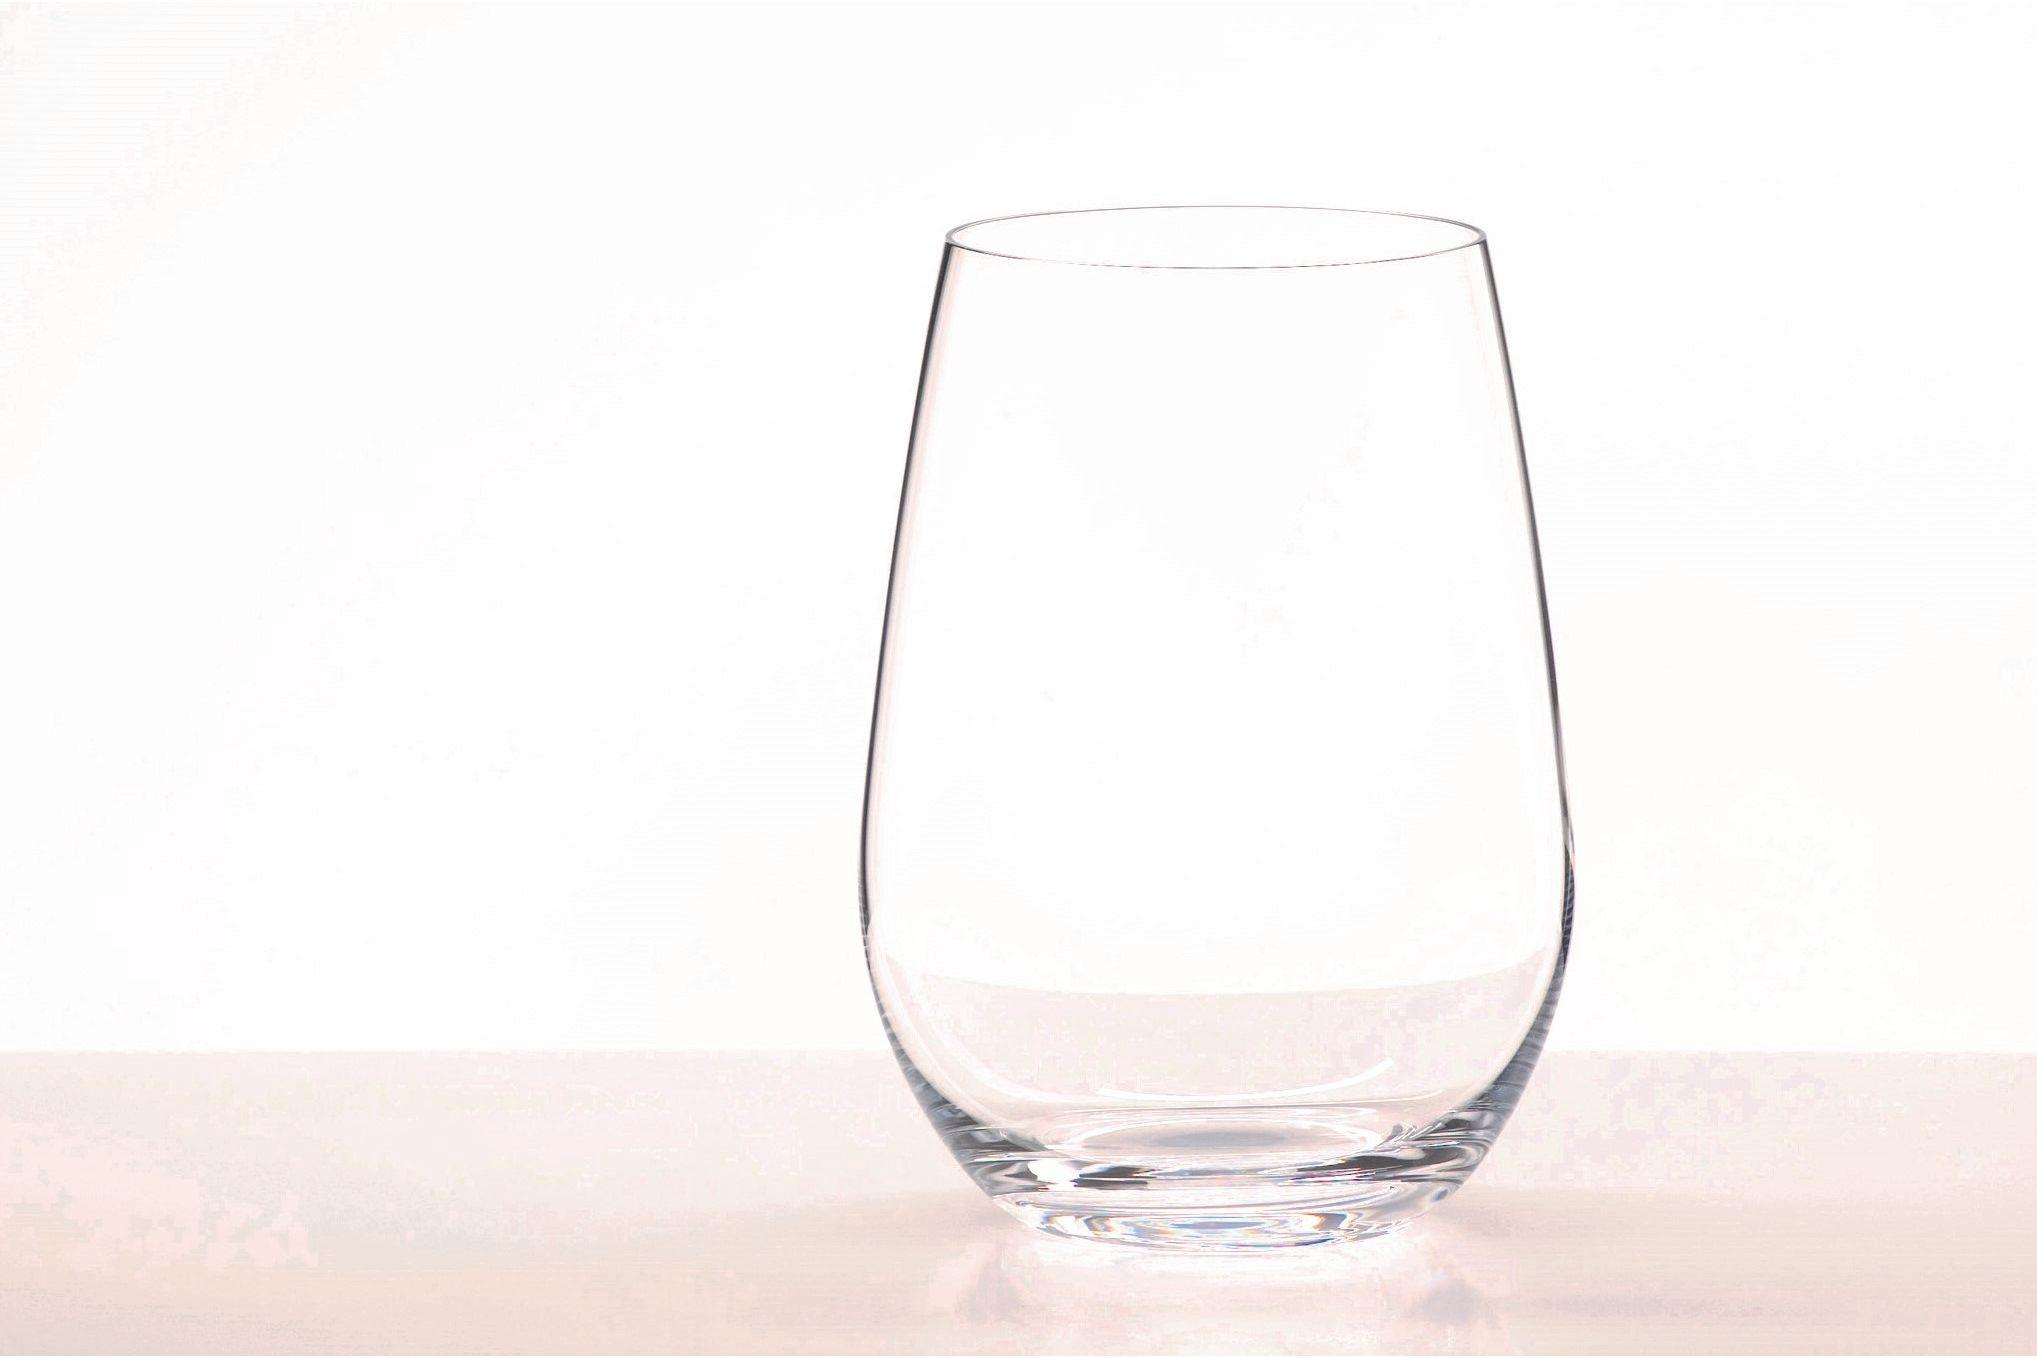 Riedel Riedel O Pair of White Wine Glasses Riesling/Sauvignon Blanc 375ml thumb 3